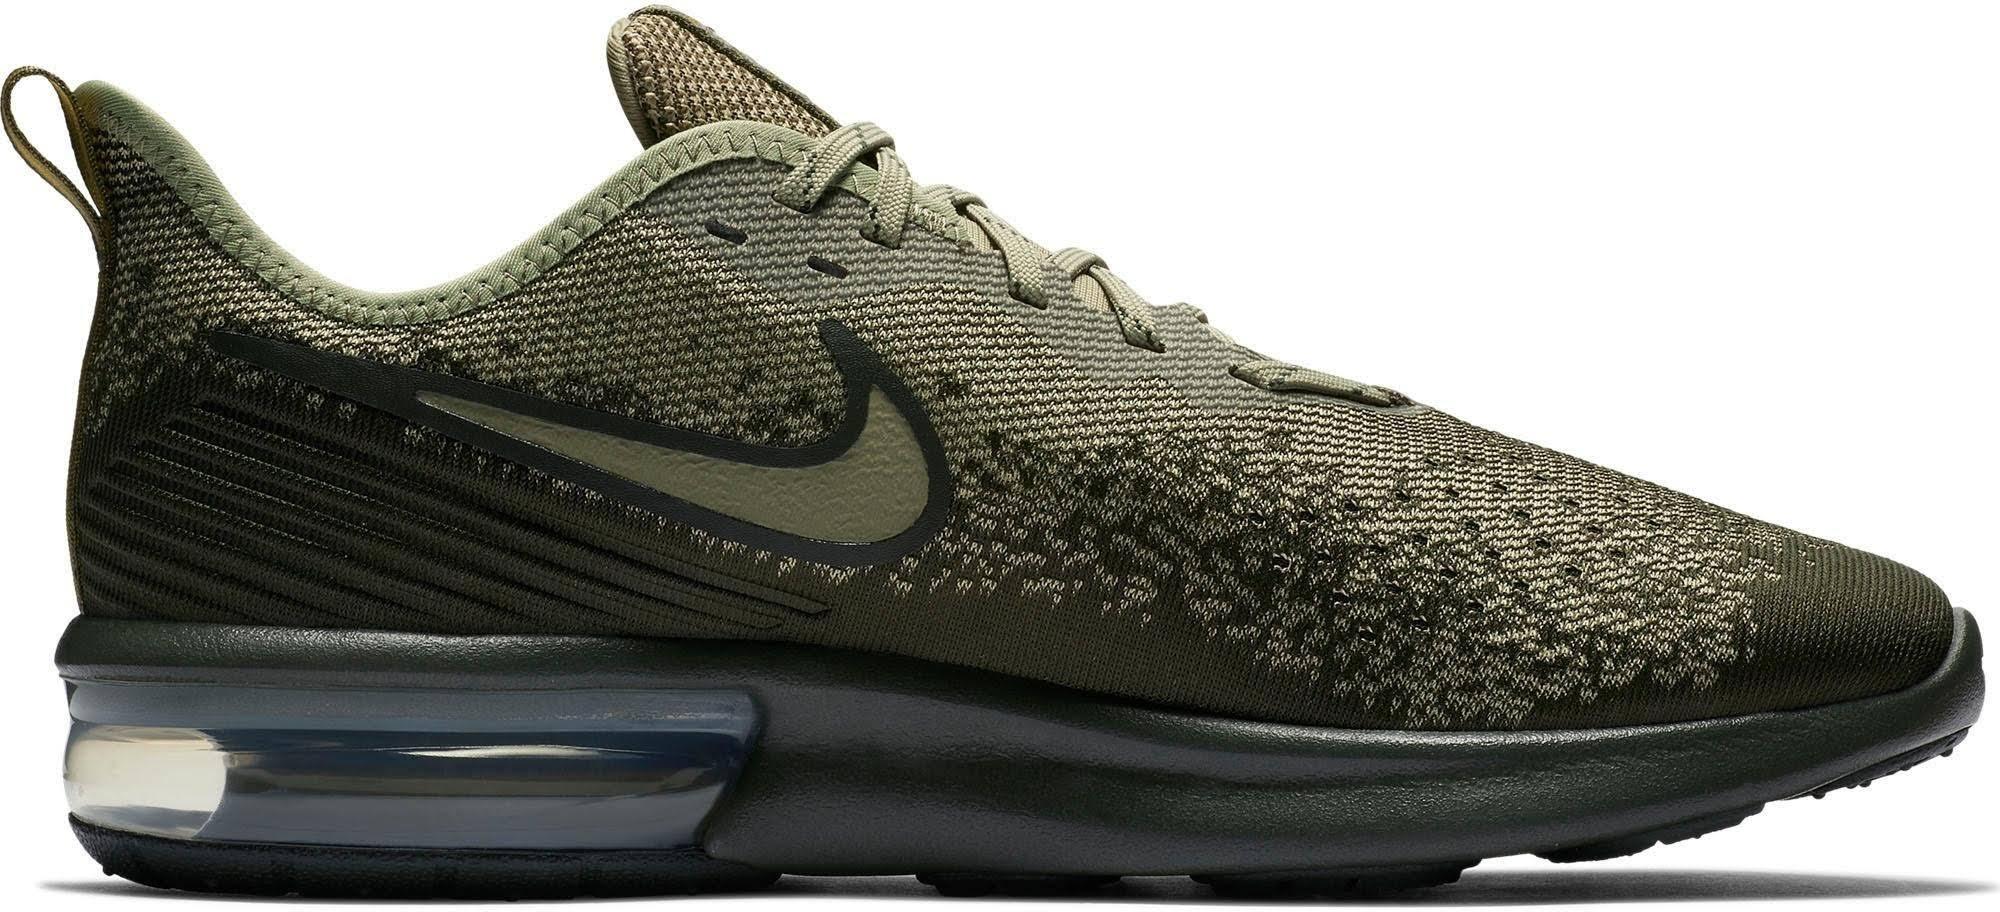 Nike Olive Herenschoen Sequent Air 4 Max Groen FwfraqFWp